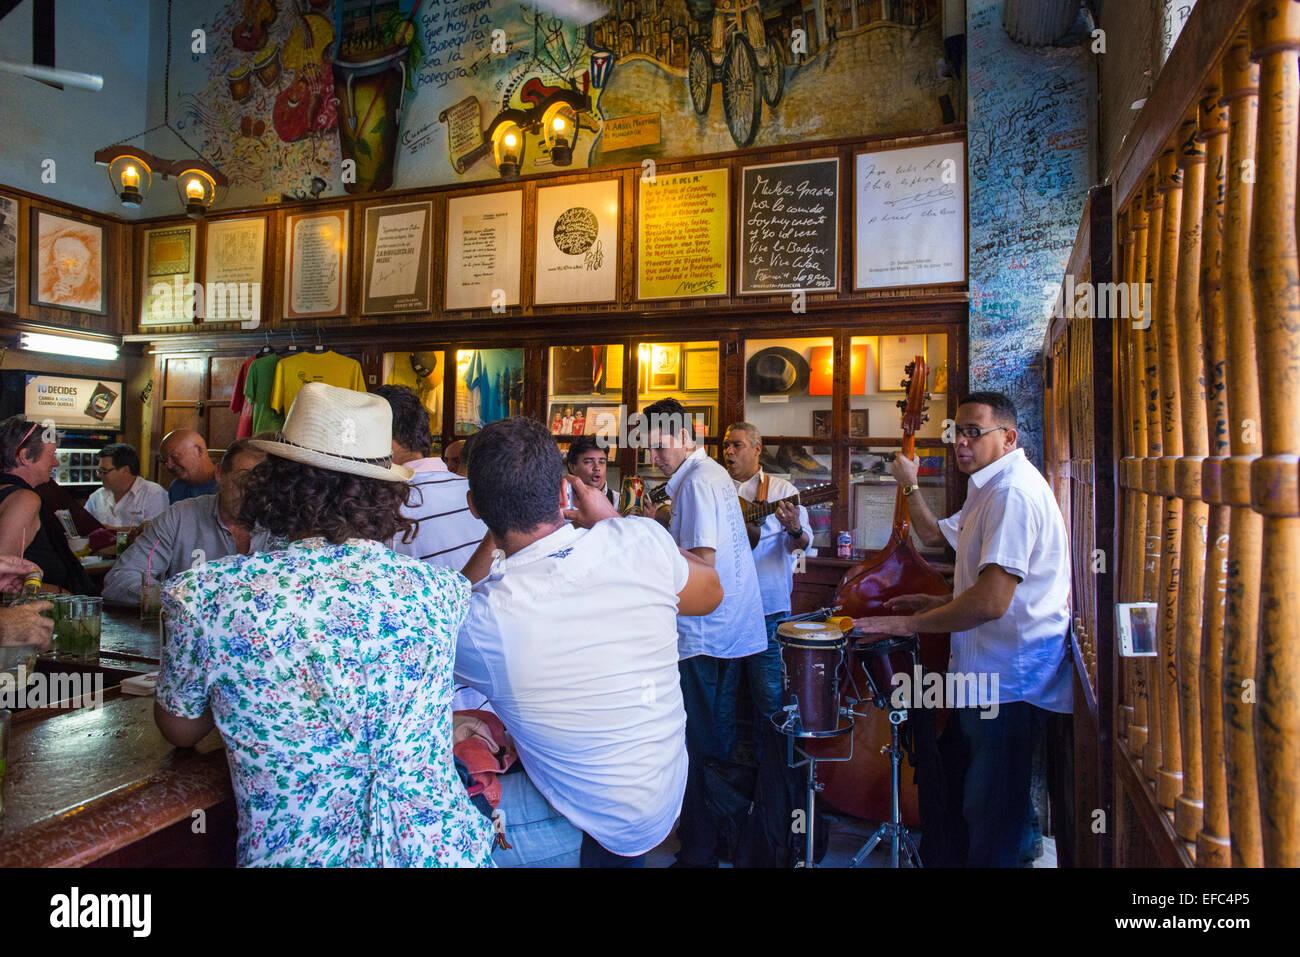 Cuba La Habana Vieja La Habana Vieja La Bodeguita Del Medio Restaurante Legendario Bar De Ernest Hemingway Fama Bebedores Hijo Band Fotografía De Stock Alamy